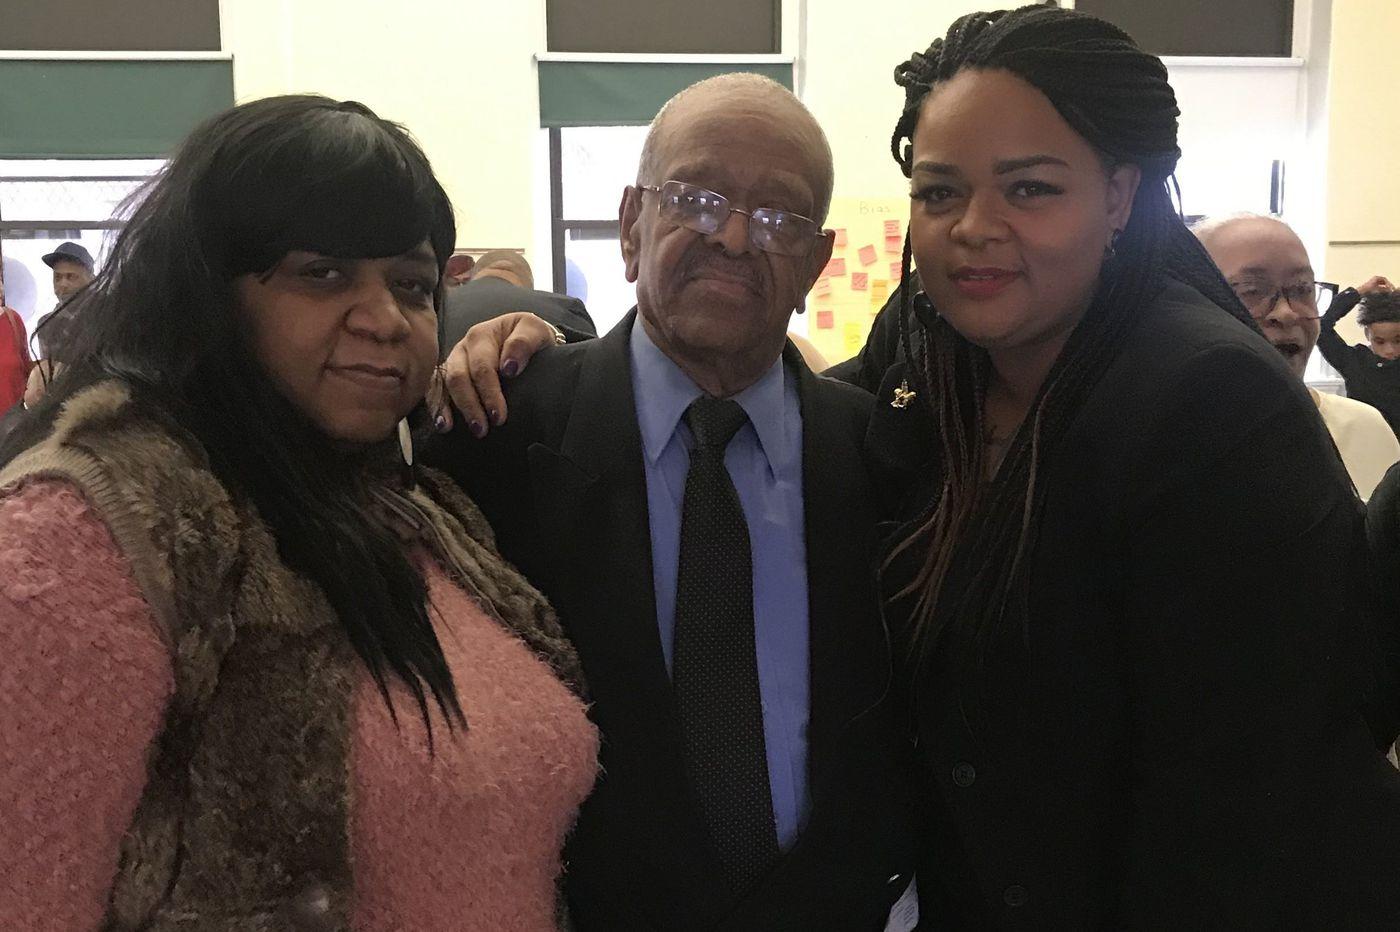 Anibal Francisco de Brito, 90, saw the world as a merchant marine but was the heart of a North Philadelphia block